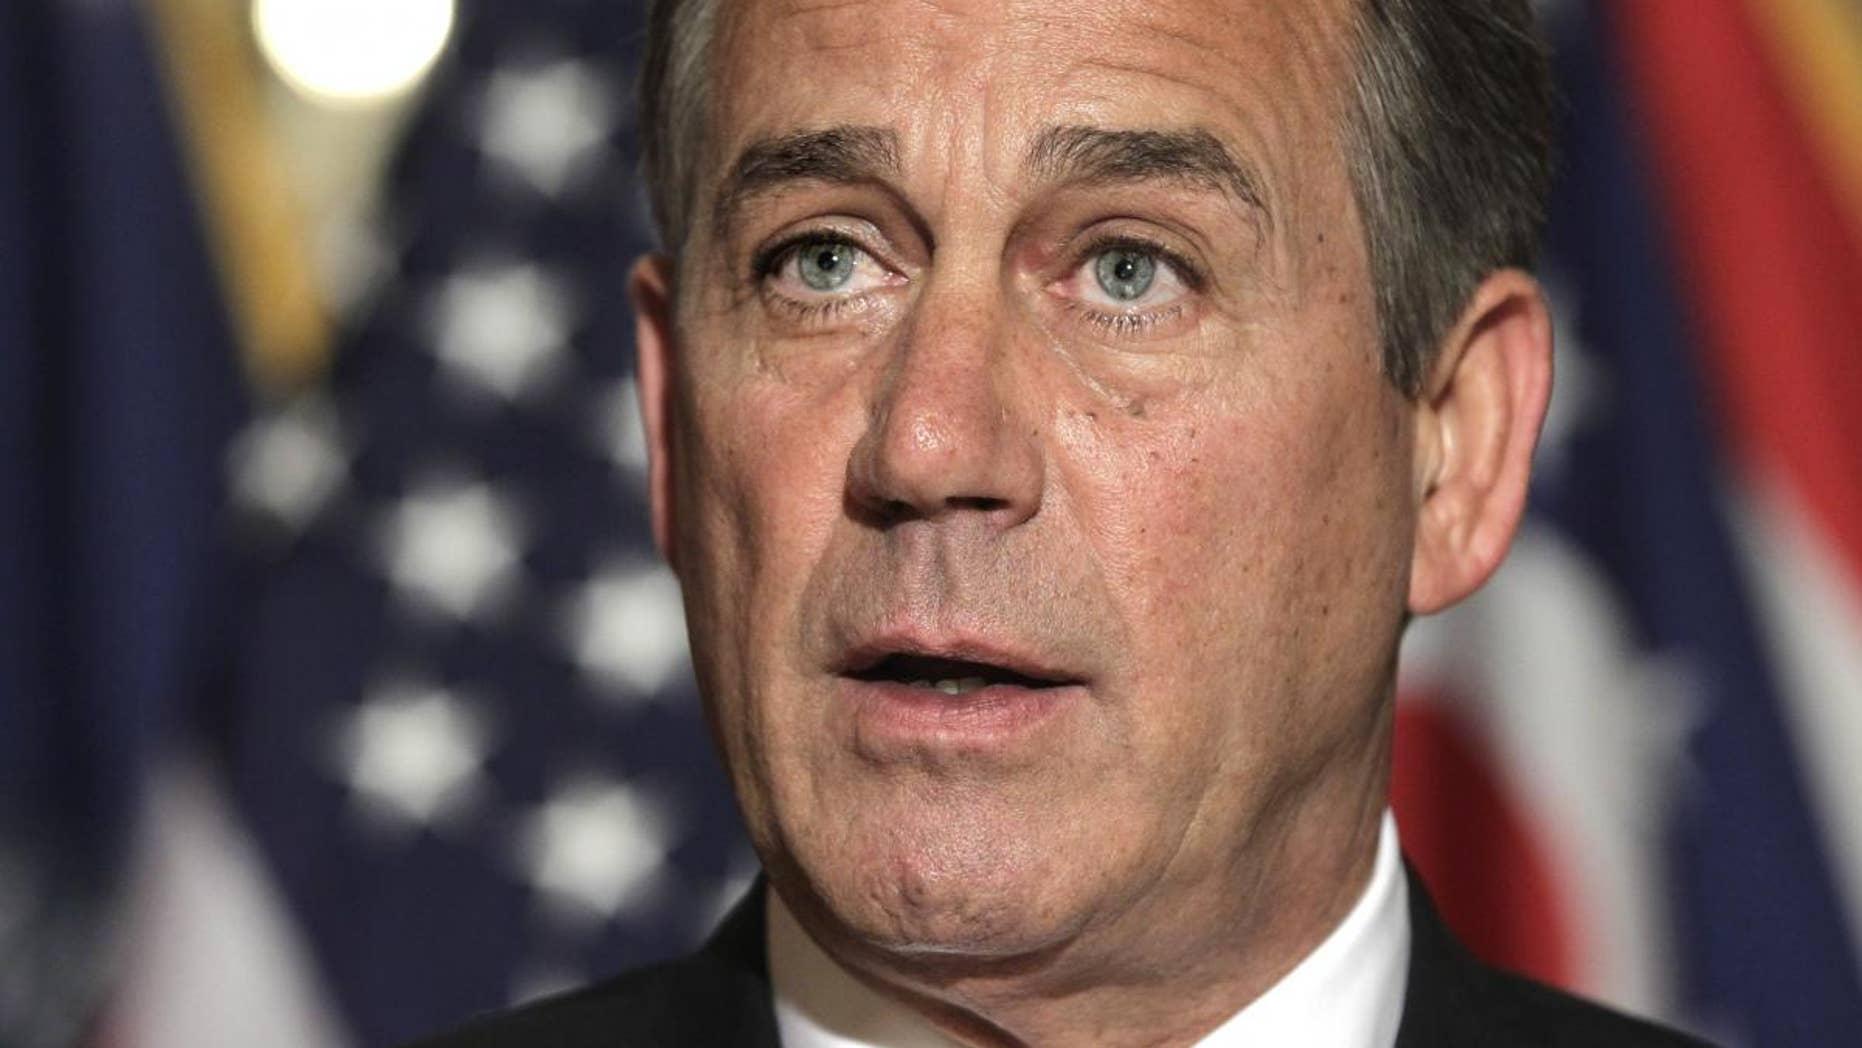 House Speaker John Boehner of Ohio speaks on Capitol Hill in Washington, Friday, April 8, 2011, to respond to criticism by Senate Majority Leader Harry Reid of Nev. on the budget impasse. (AP Photo/J. Scott Applewhite)